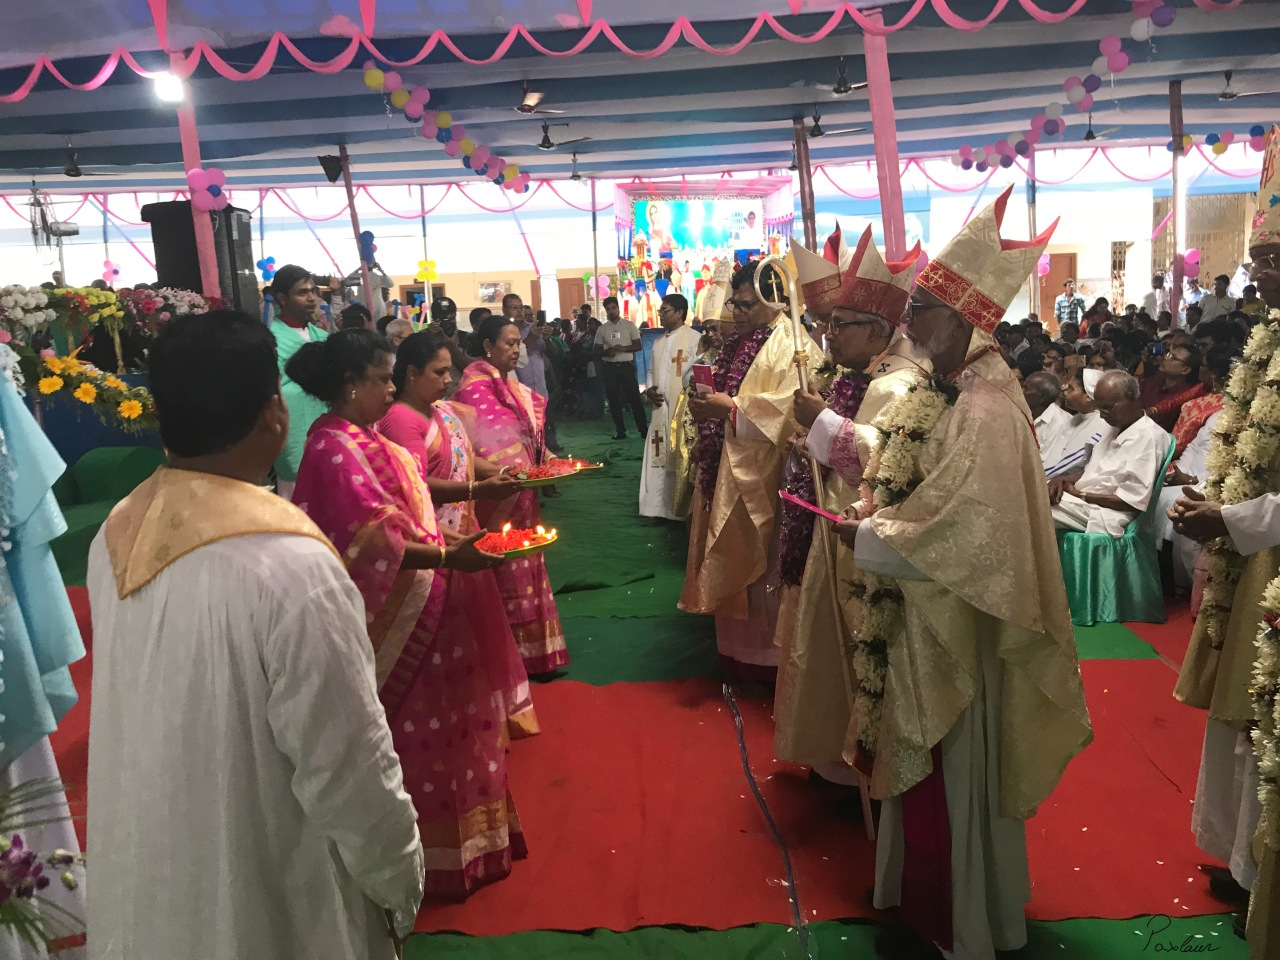 Consacrarea episcopului de Baruipur - Calcutta - India